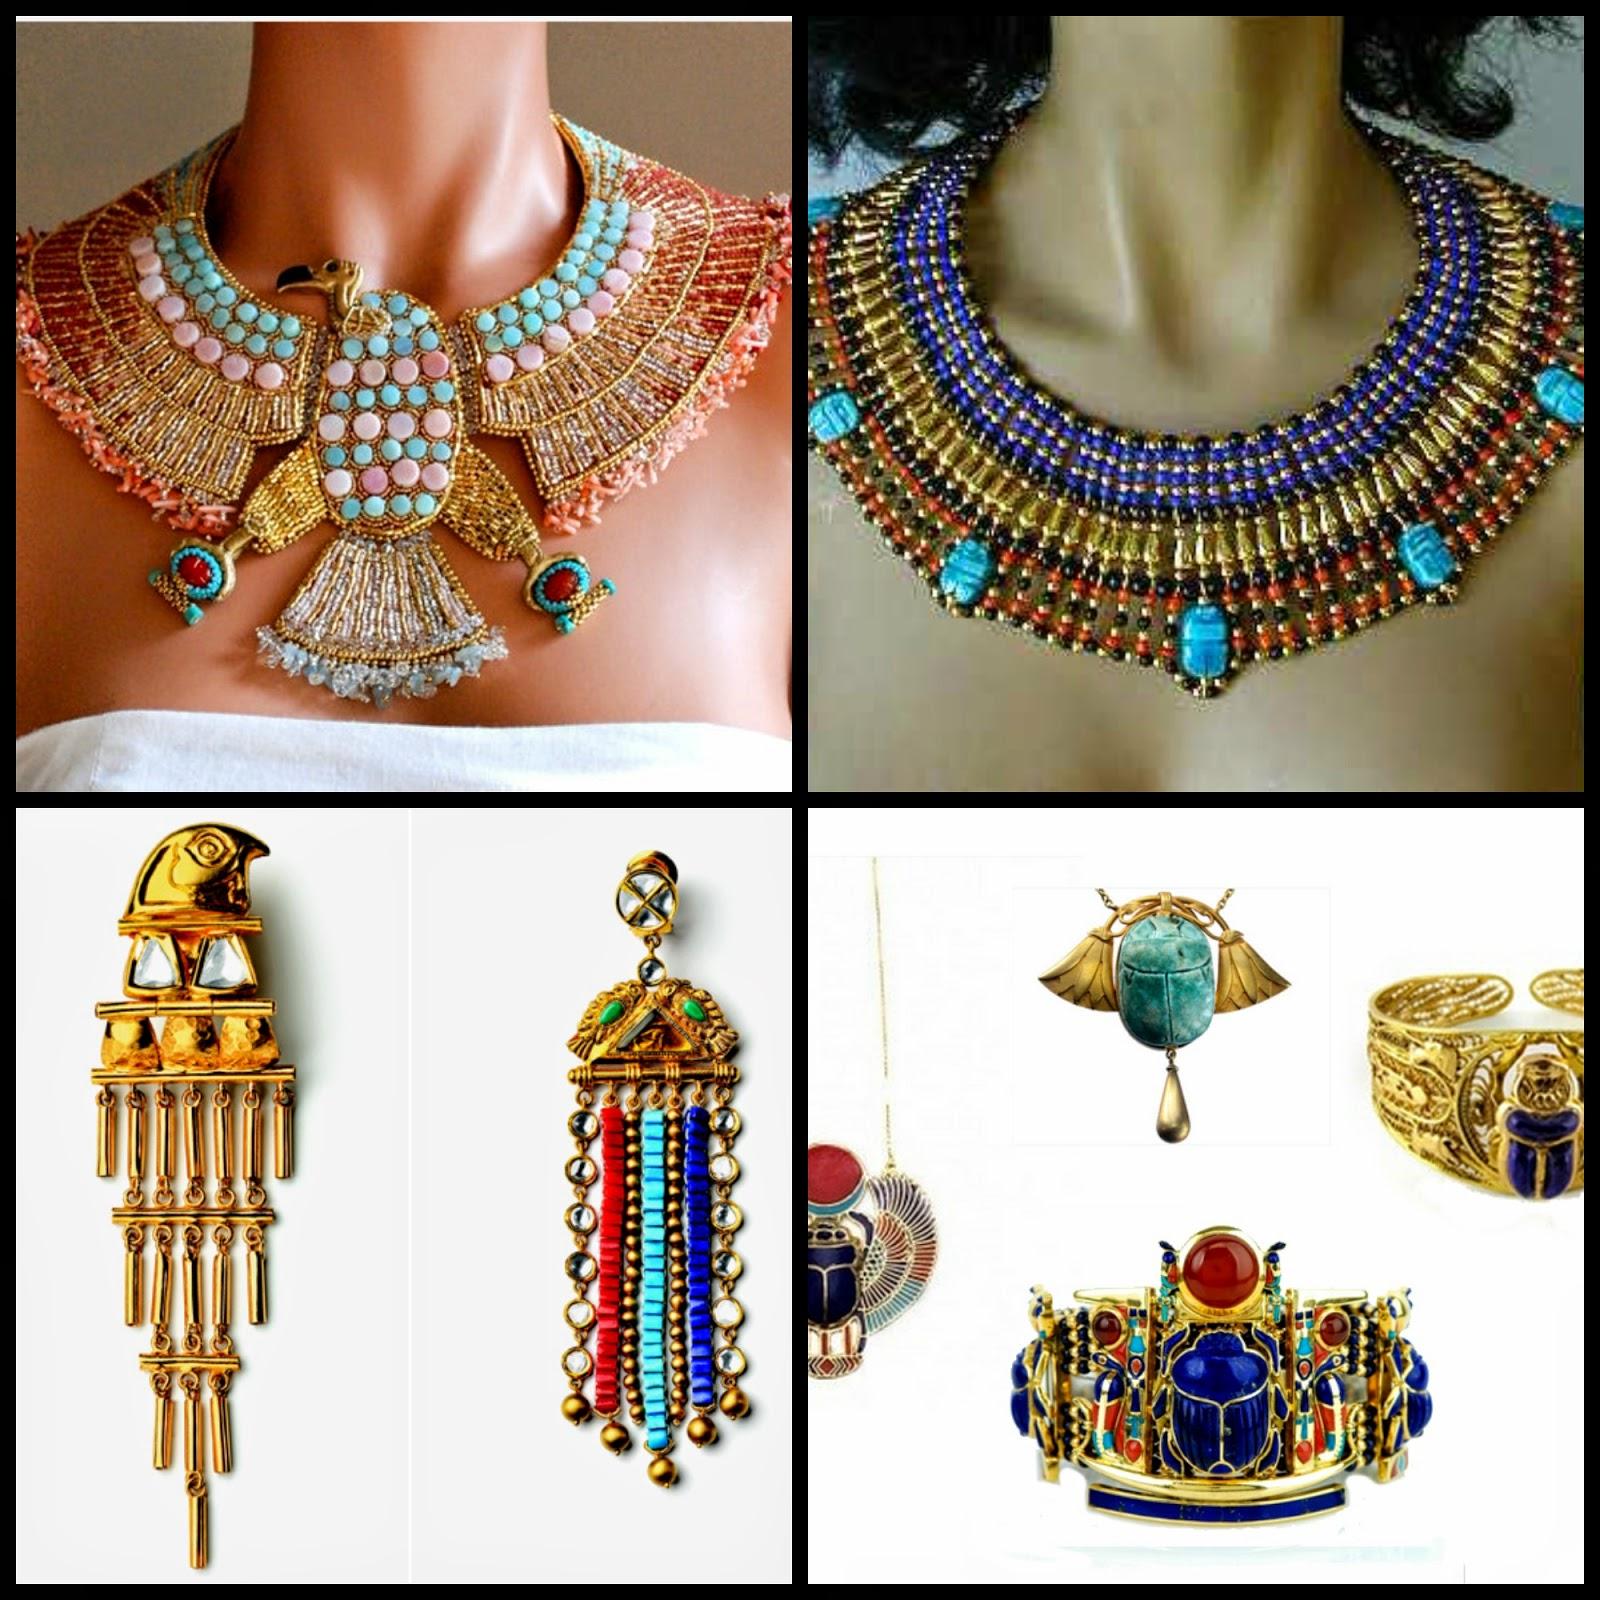 Contextual studies: Ancient Egyptian inspiration - Jewelry